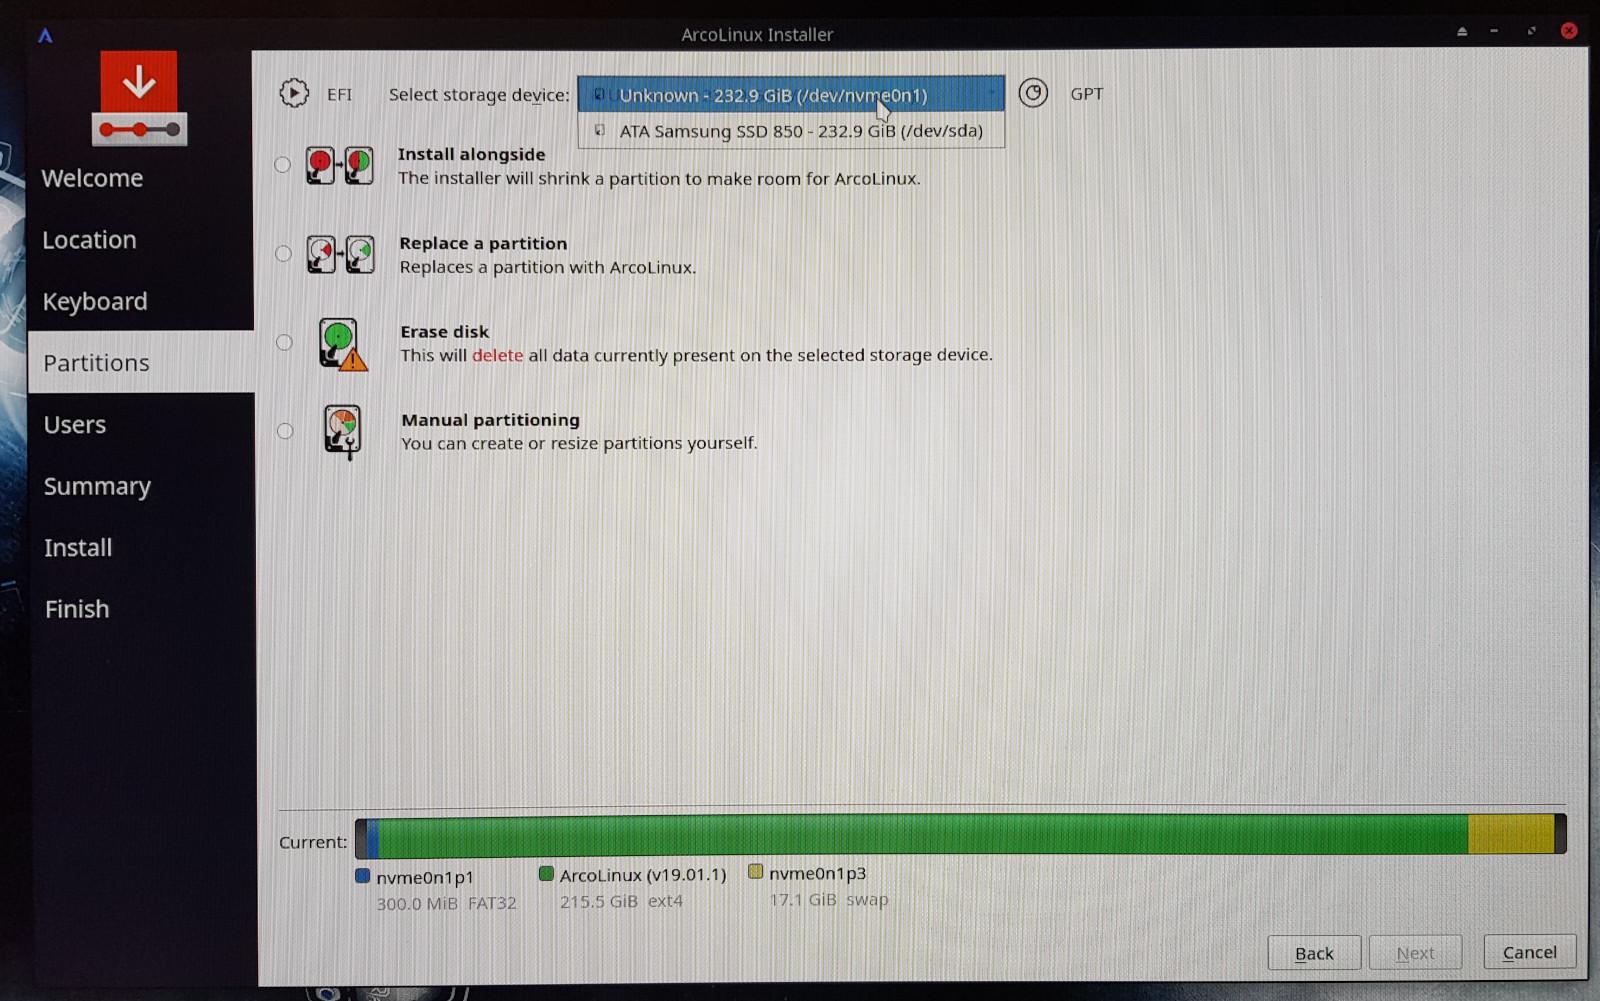 Installing ArcoLinux on Samsung 970 Evo NVMe M 2 | Arcolinux com